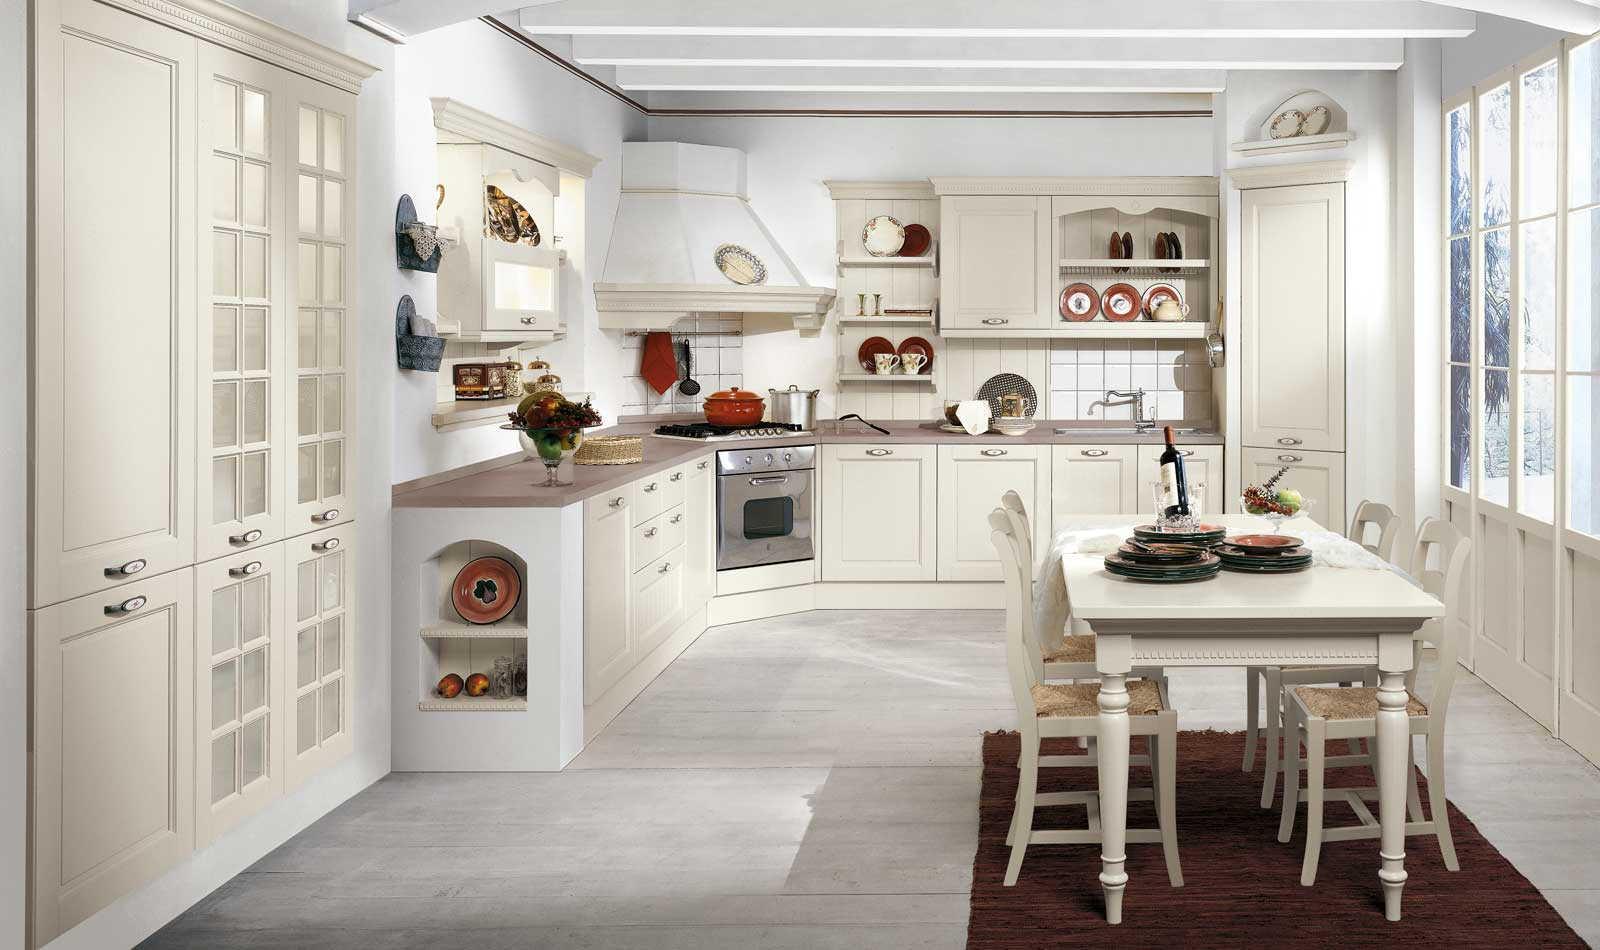 Virginia: la cucina classica - Negozio Arredamento